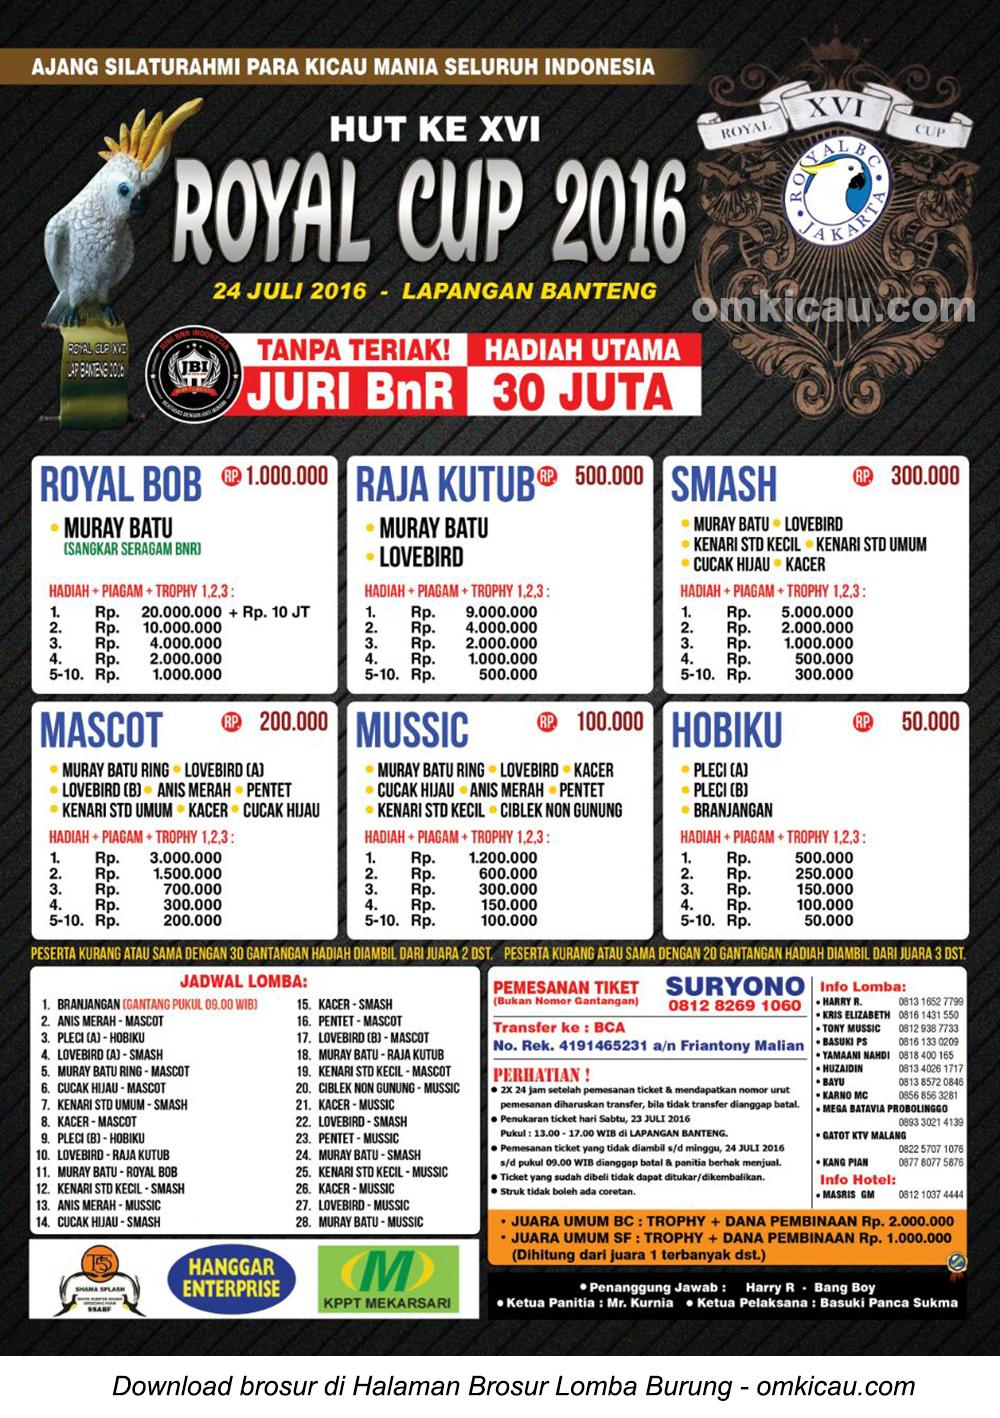 Brosur Lomba Burung Berkicau Royal Cup 2016, Jakarta, 24 Juli 2016